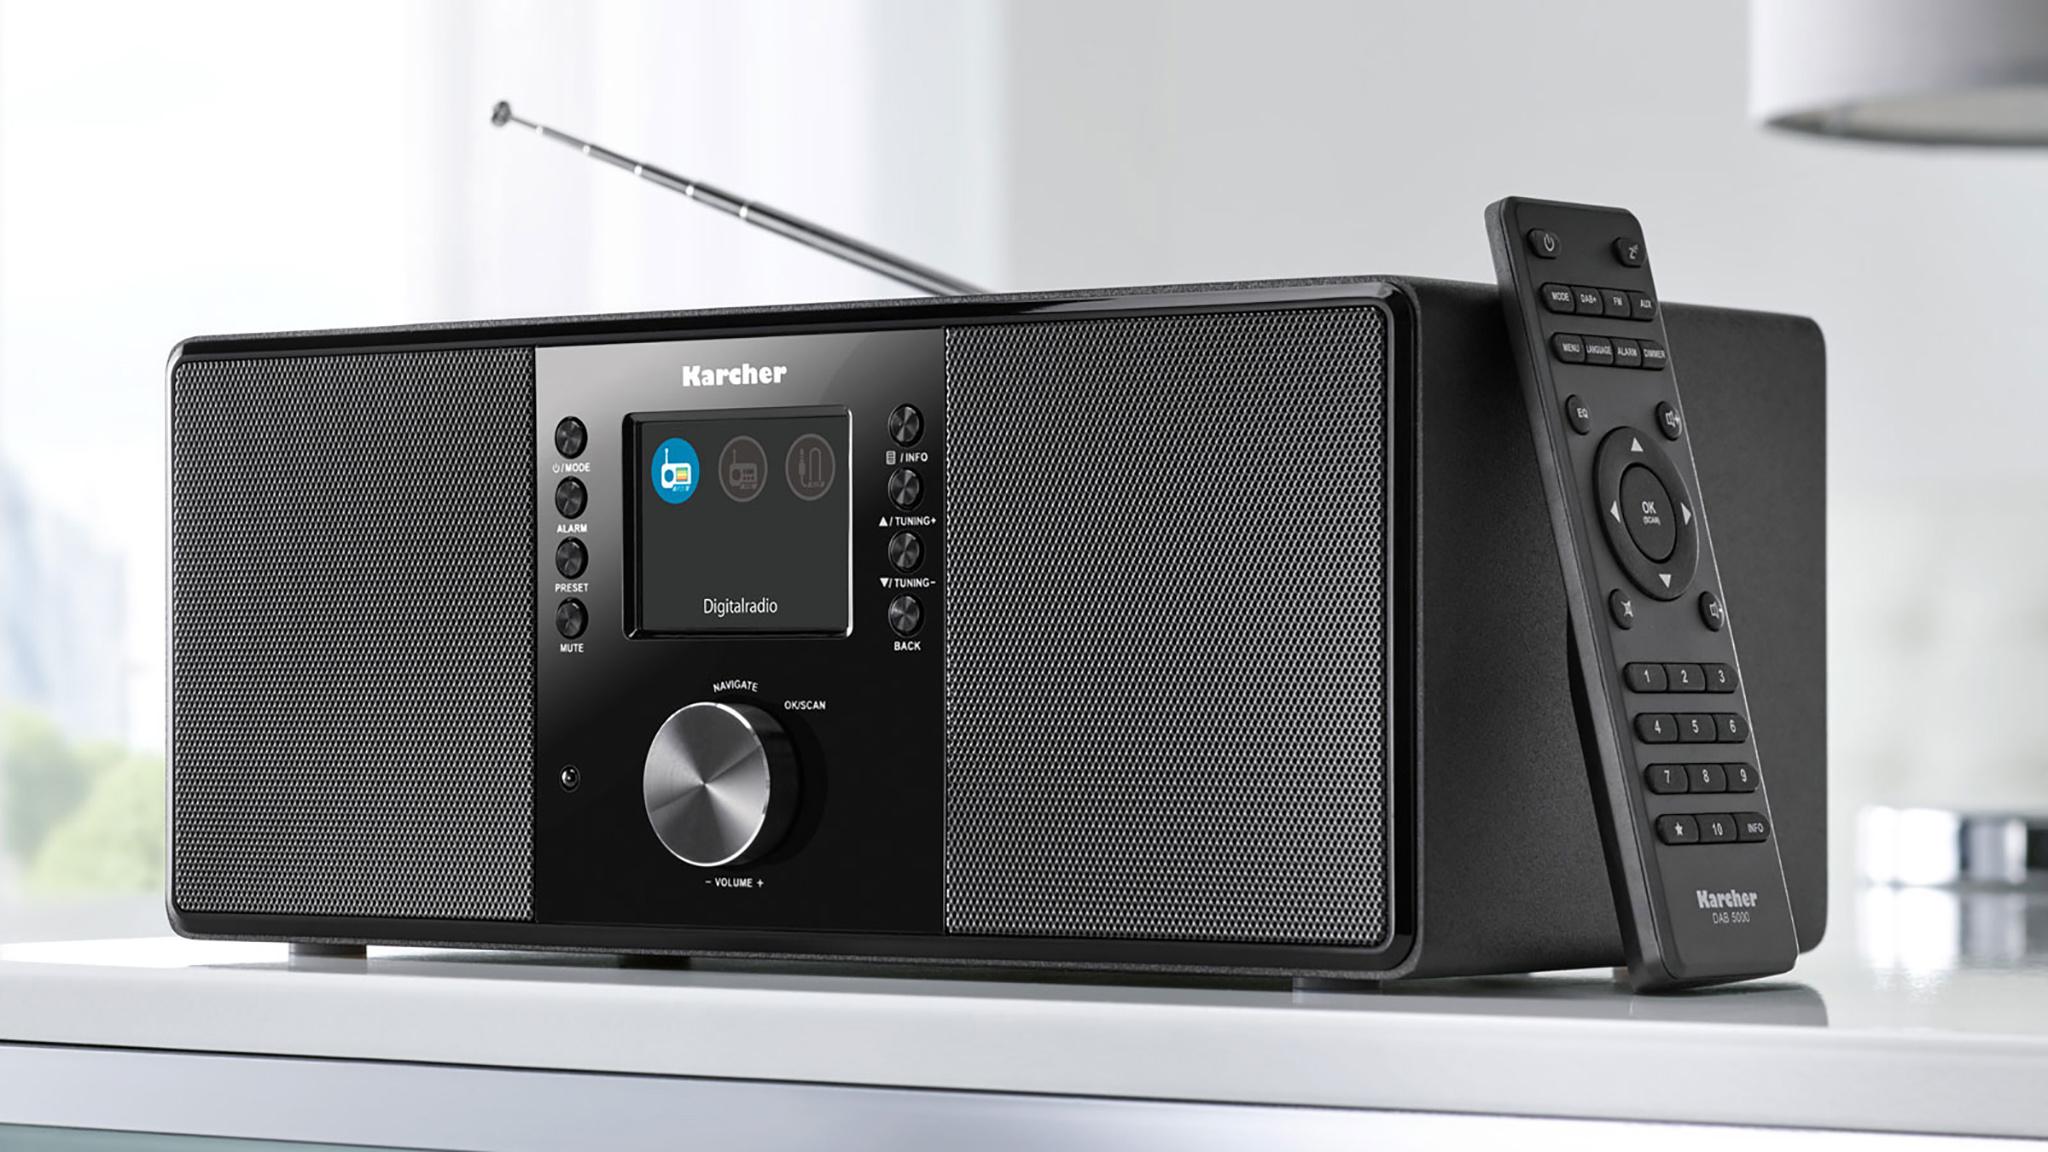 dab radio im test karcher dab 5000 computer bild. Black Bedroom Furniture Sets. Home Design Ideas